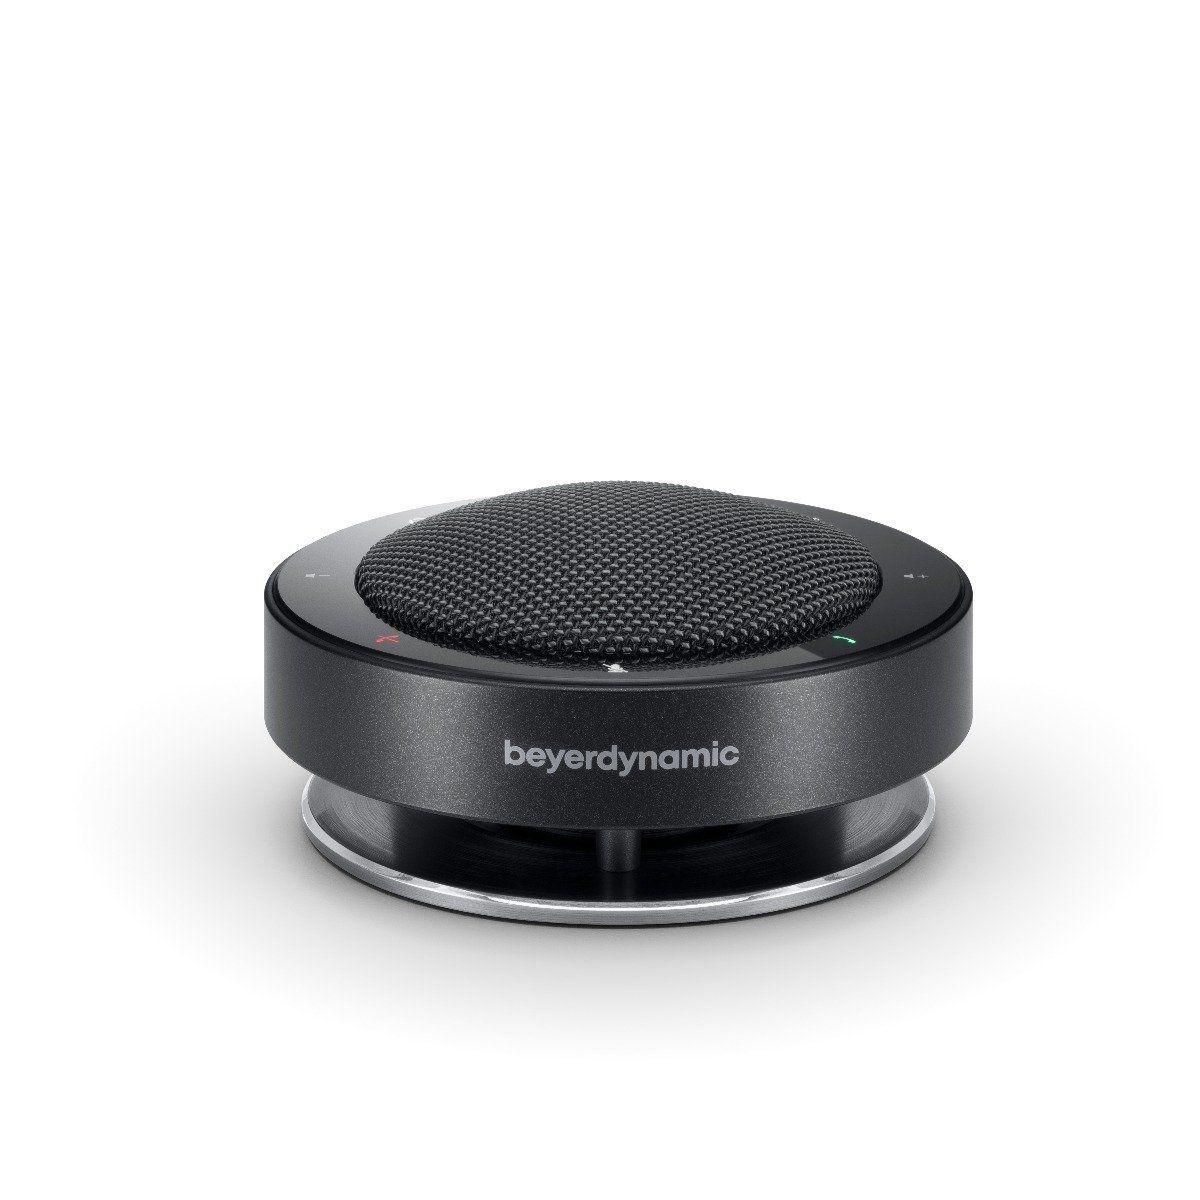 Beyerdynamic Phonum Wireless Bluetooth Speakerphone Konferenzlautsprecher